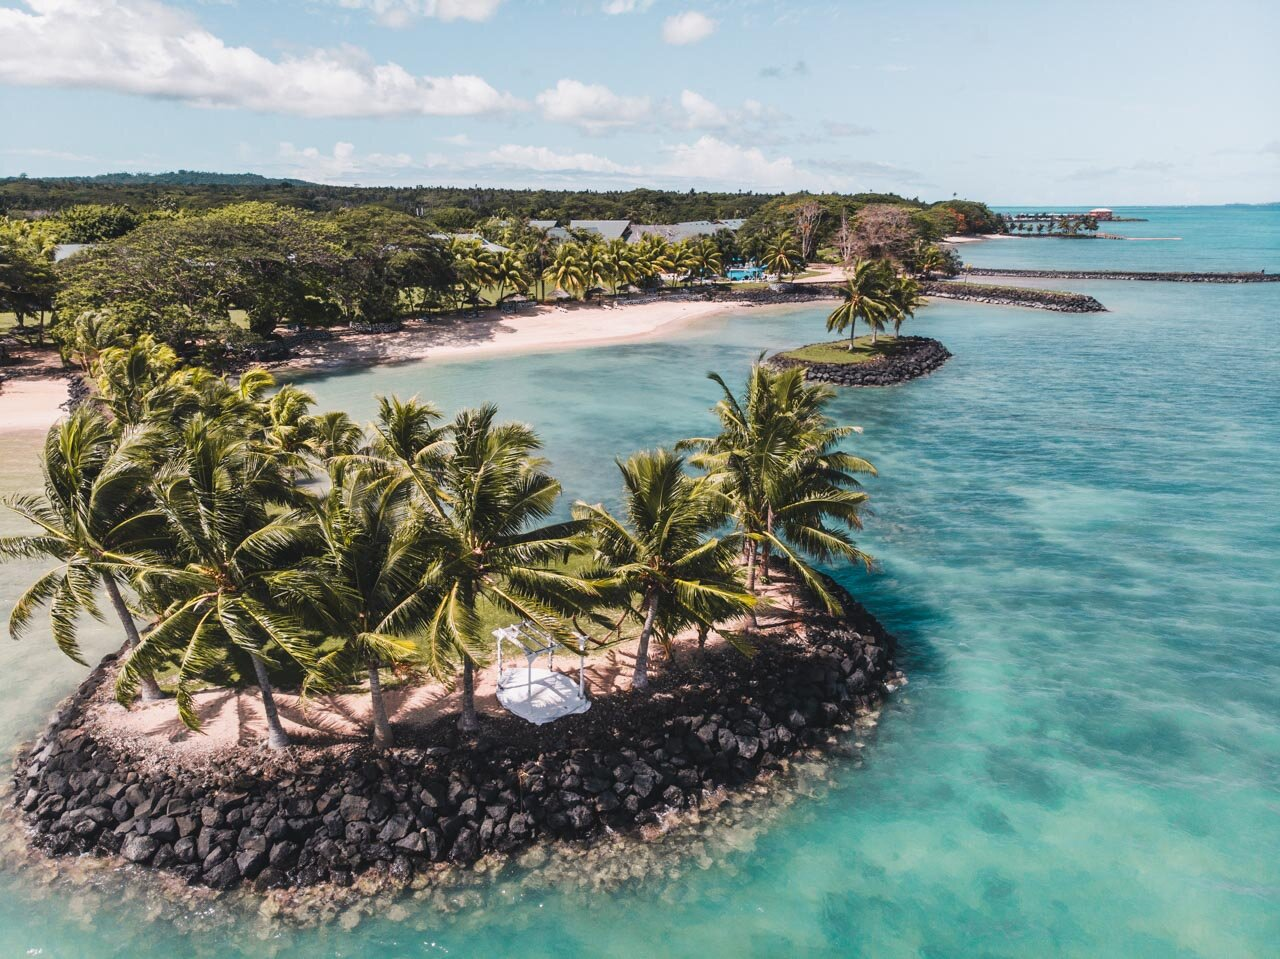 Sheraton Resort Samoa 10 day itinerary travel guide